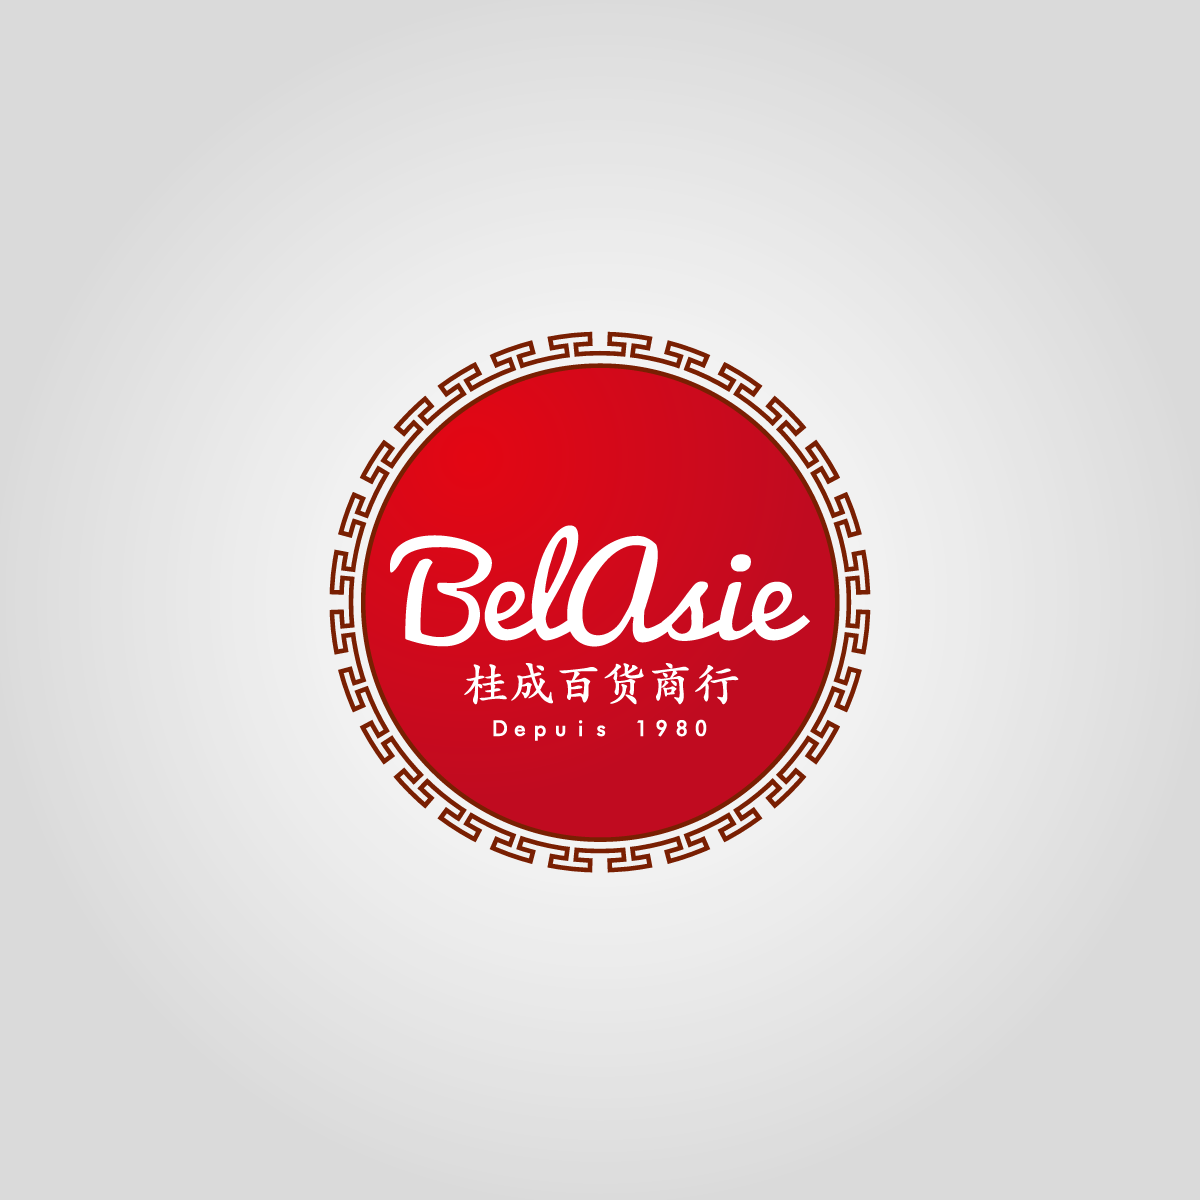 belsasie-logo